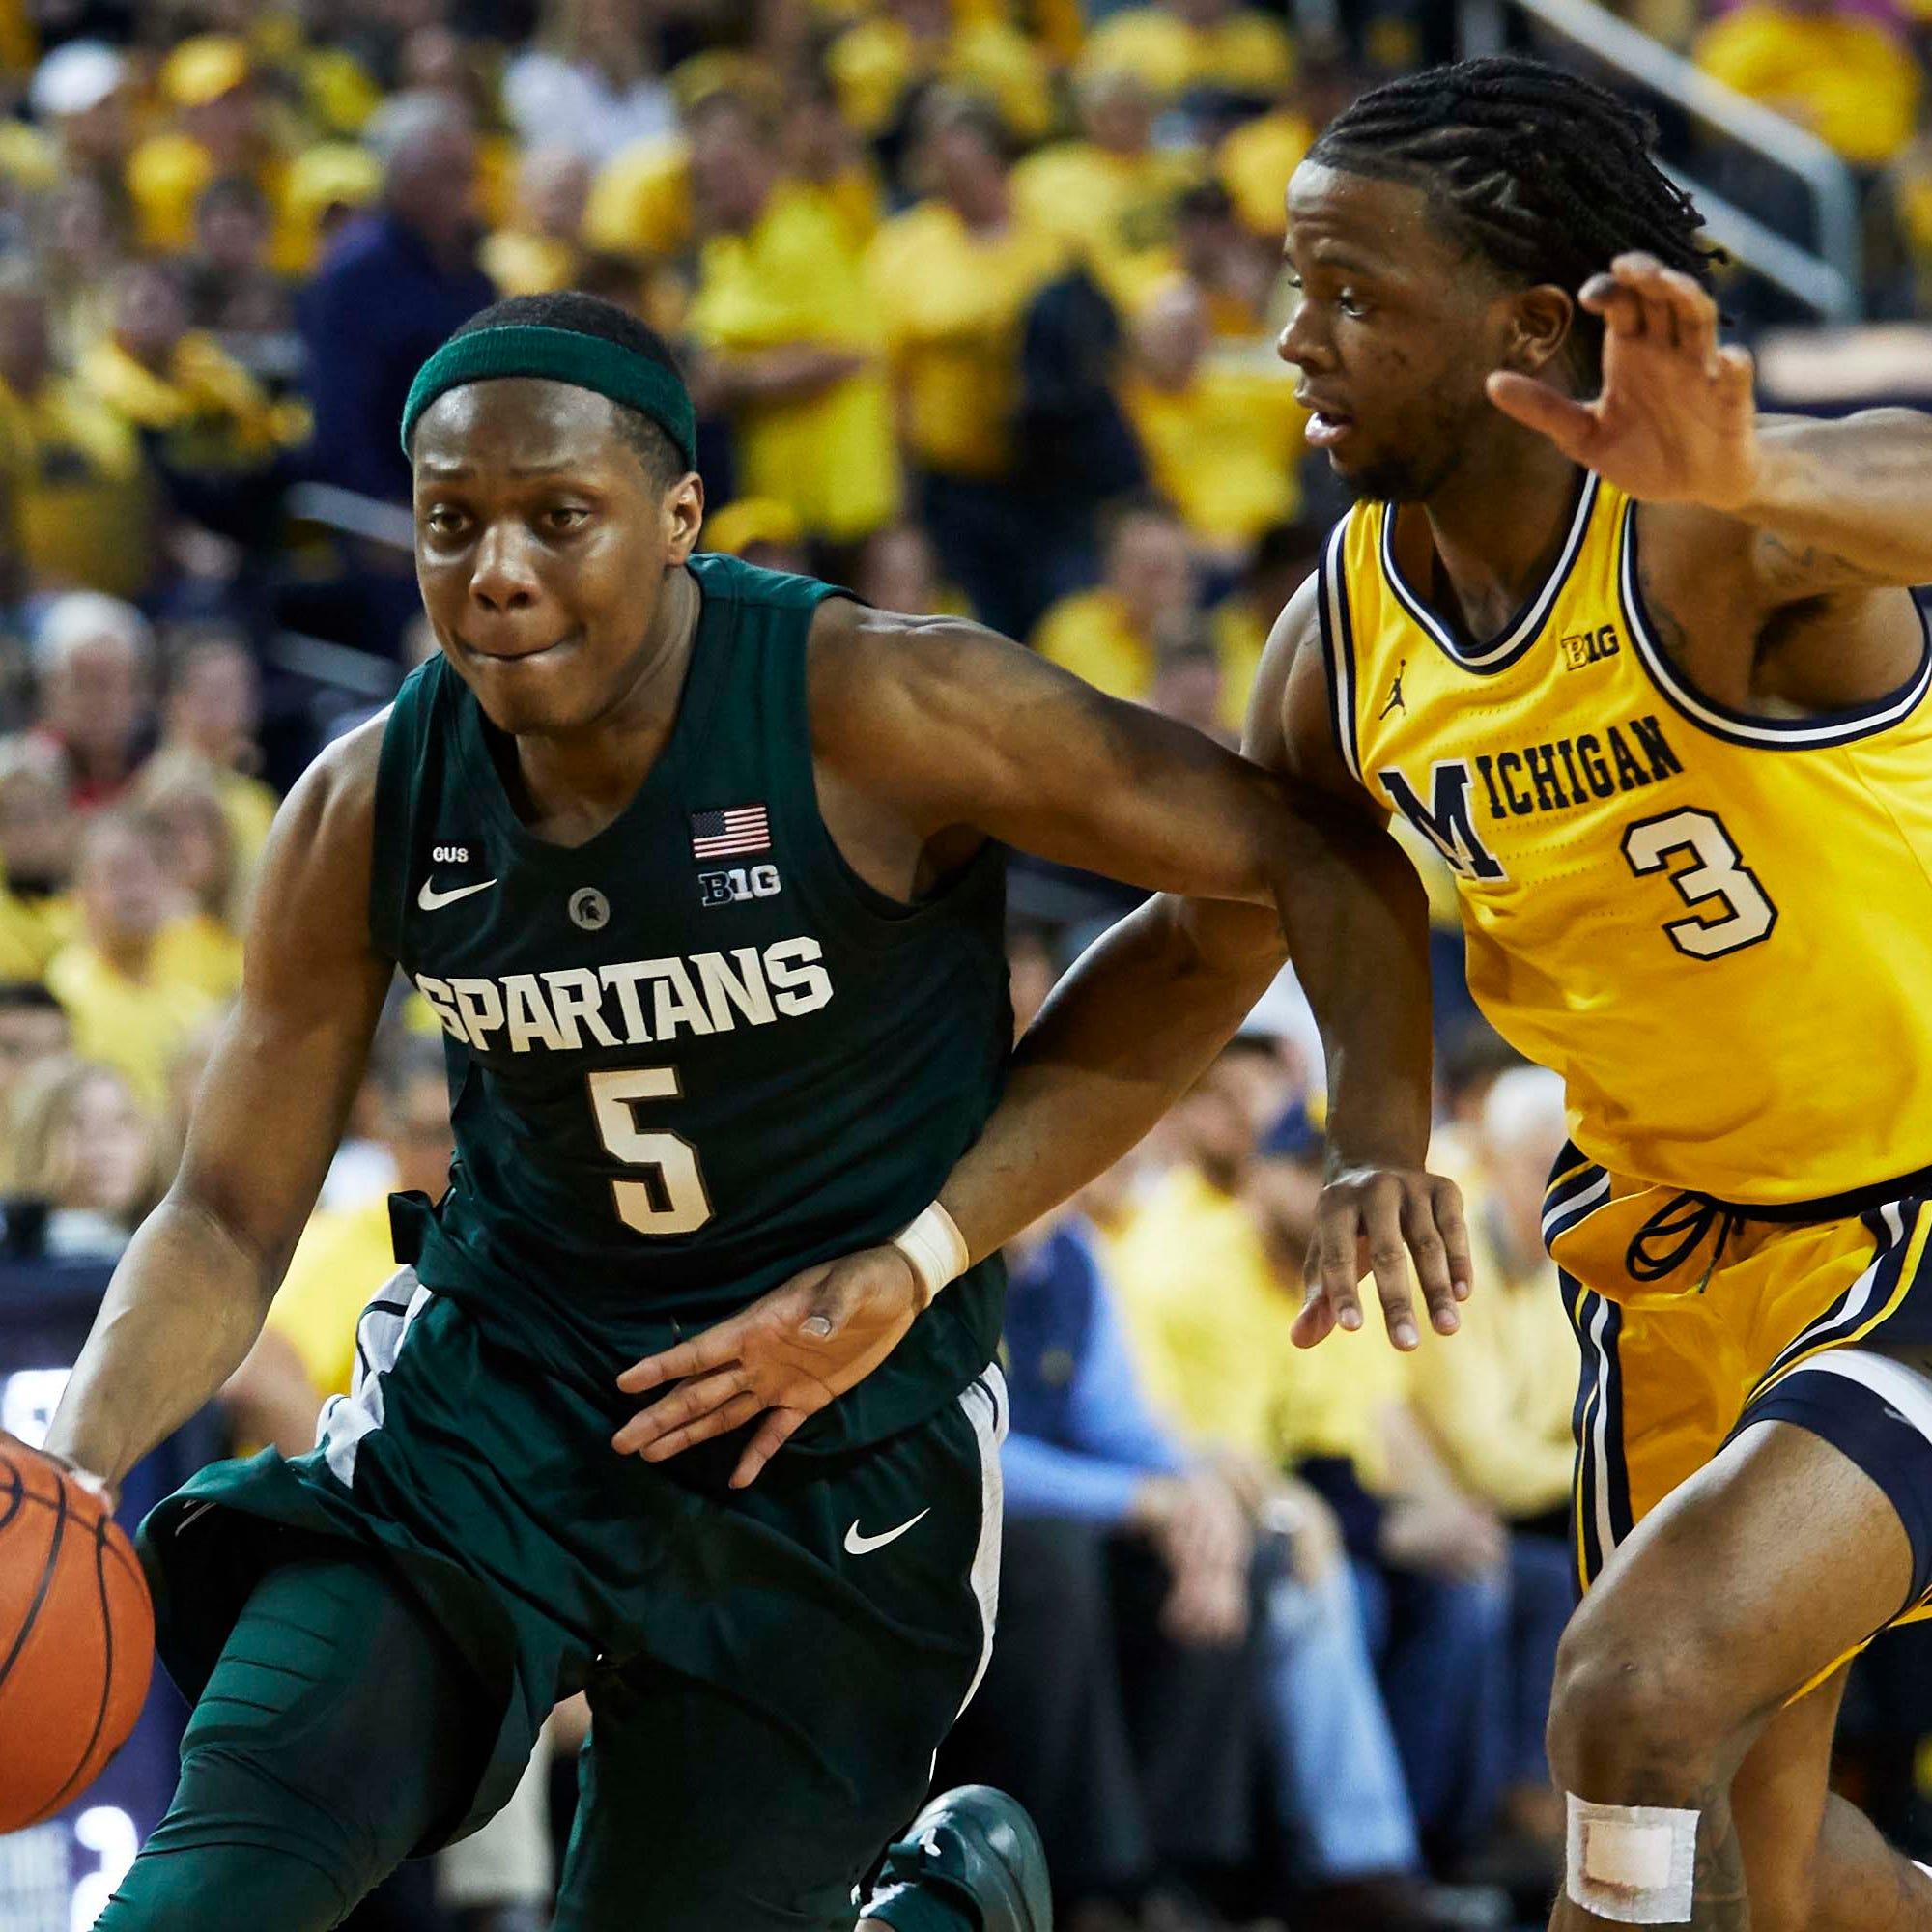 Michigan at Michigan State basketball: Scouting report, predictions